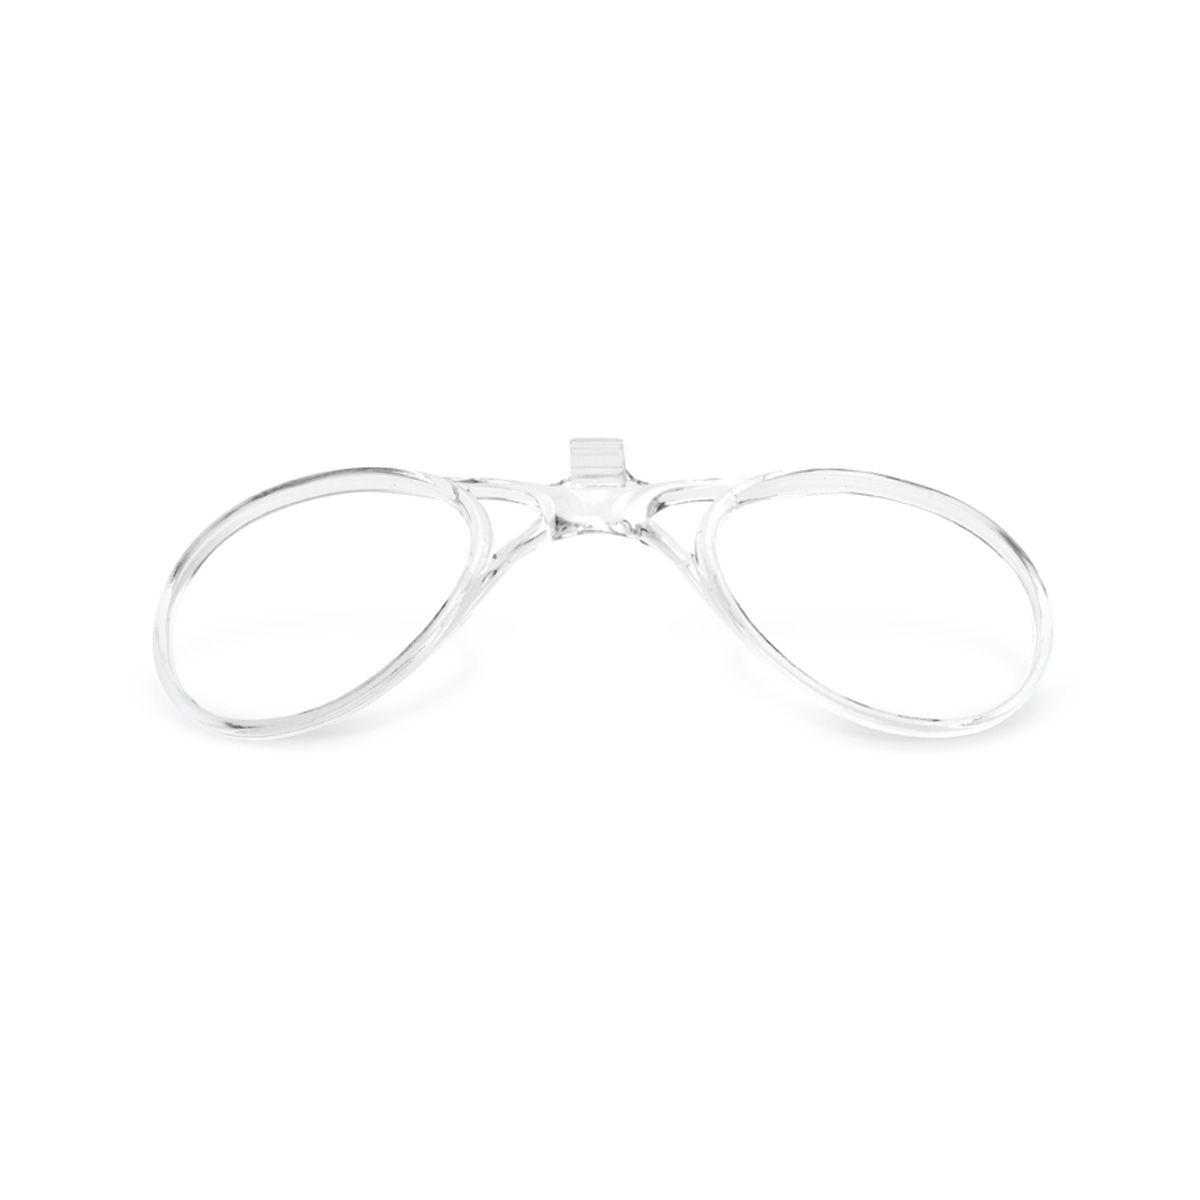 BRIKO คลิปออนใส่เลนซ์สายตา สำหรับใส่กับแว่นรุ่น CYCLOPE PHOTO (Made in Italy)